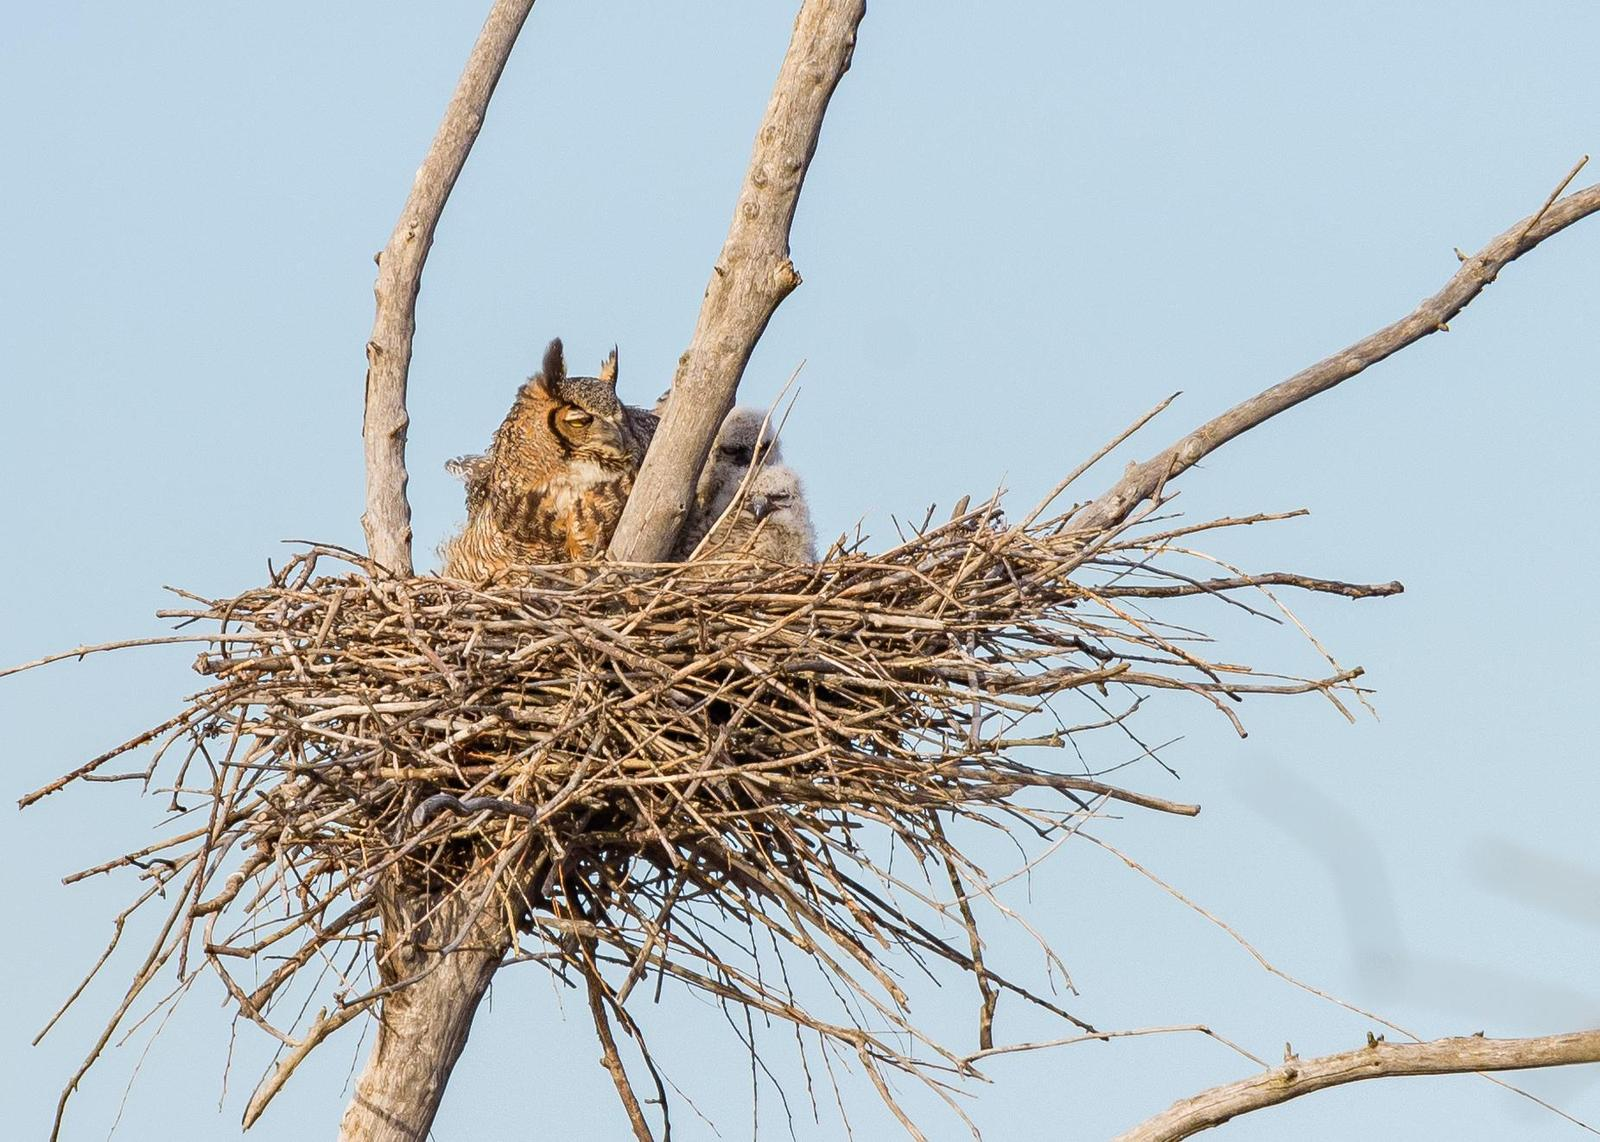 Great Horned Owl Photo by Keshava Mysore